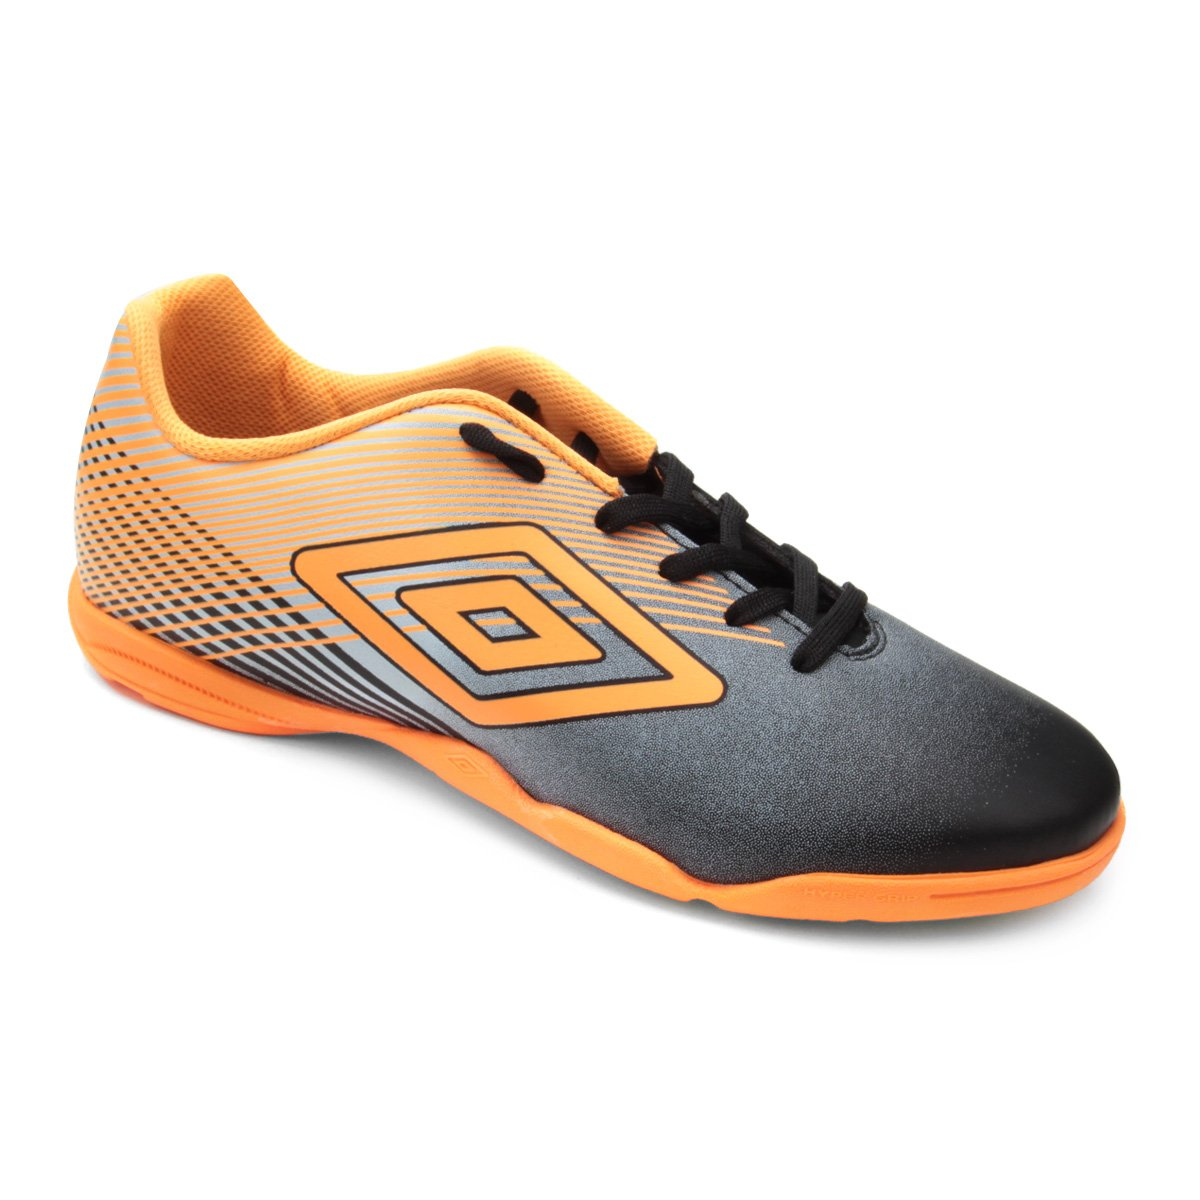 fc3be6bf1e35b Chuteira Futsal Umbro Slice III - Compre Agora